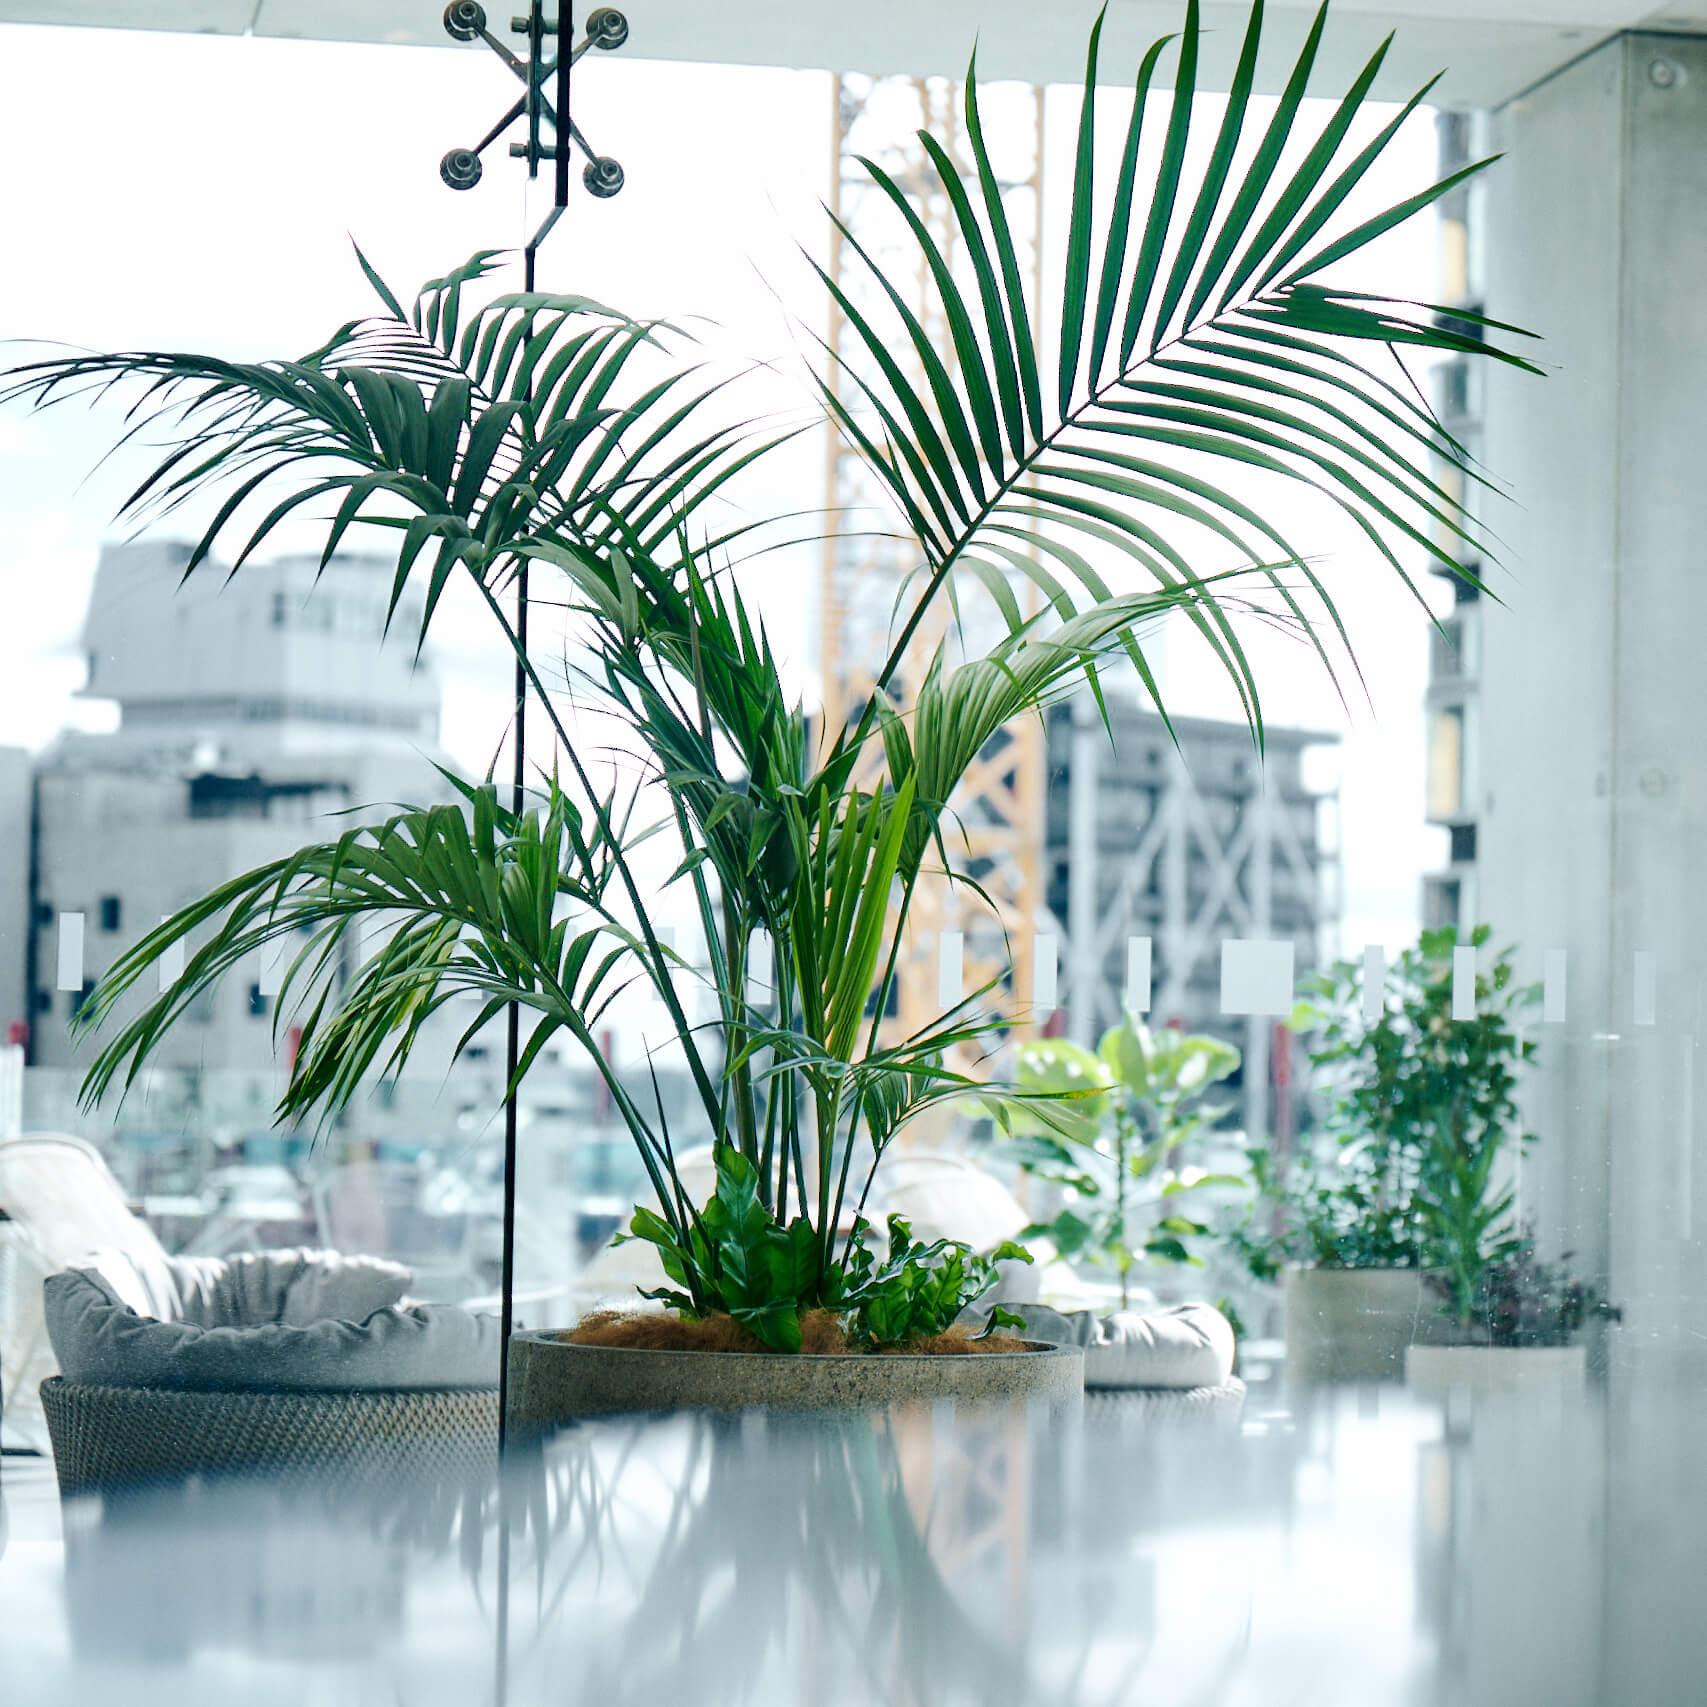 portfolio-offices-spaces-lumley-image9